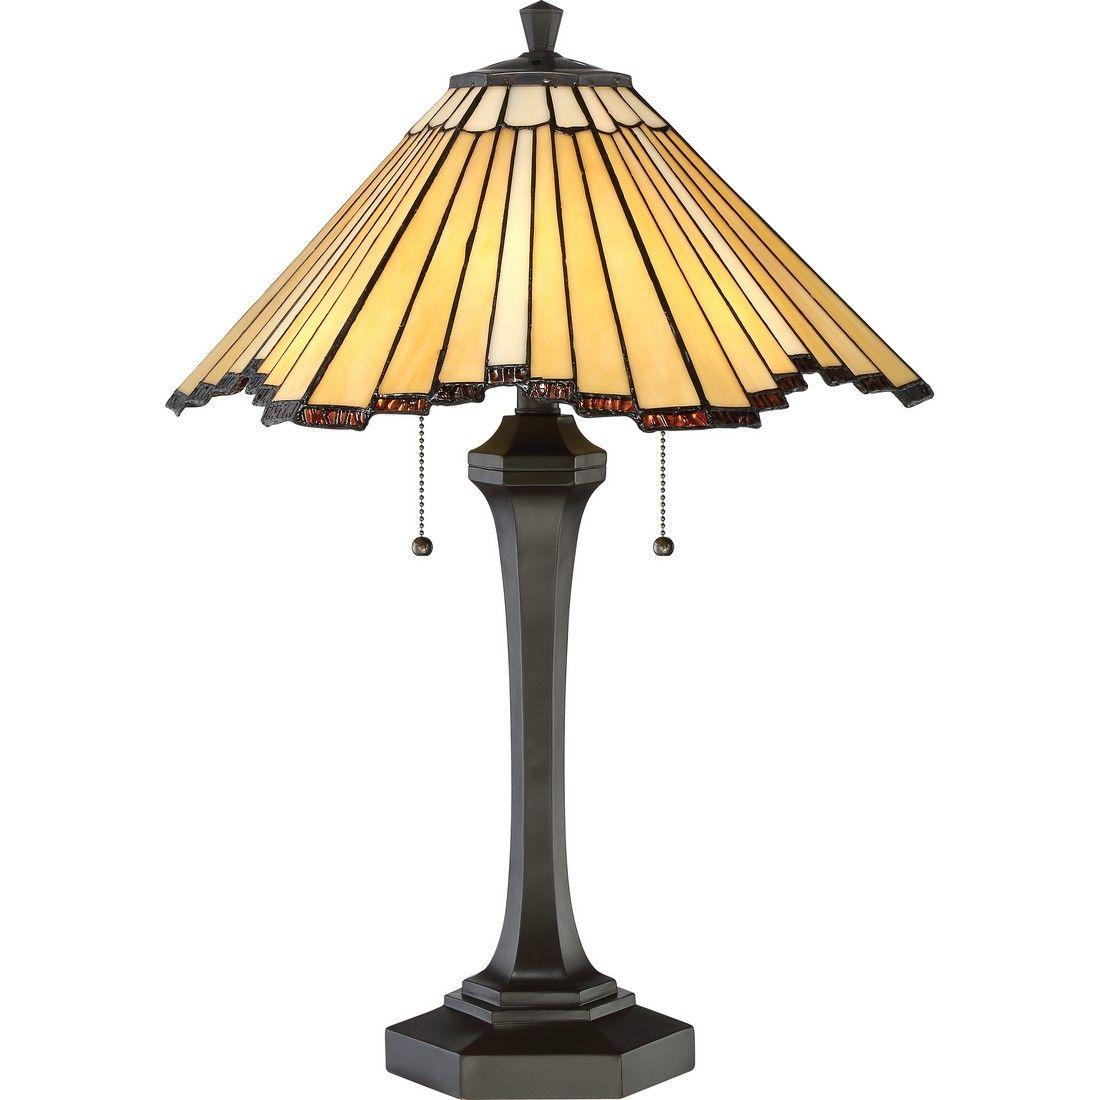 Quoizel Tiffany 24 75 2 Light Tiffany Table Lamp In Western Bronze